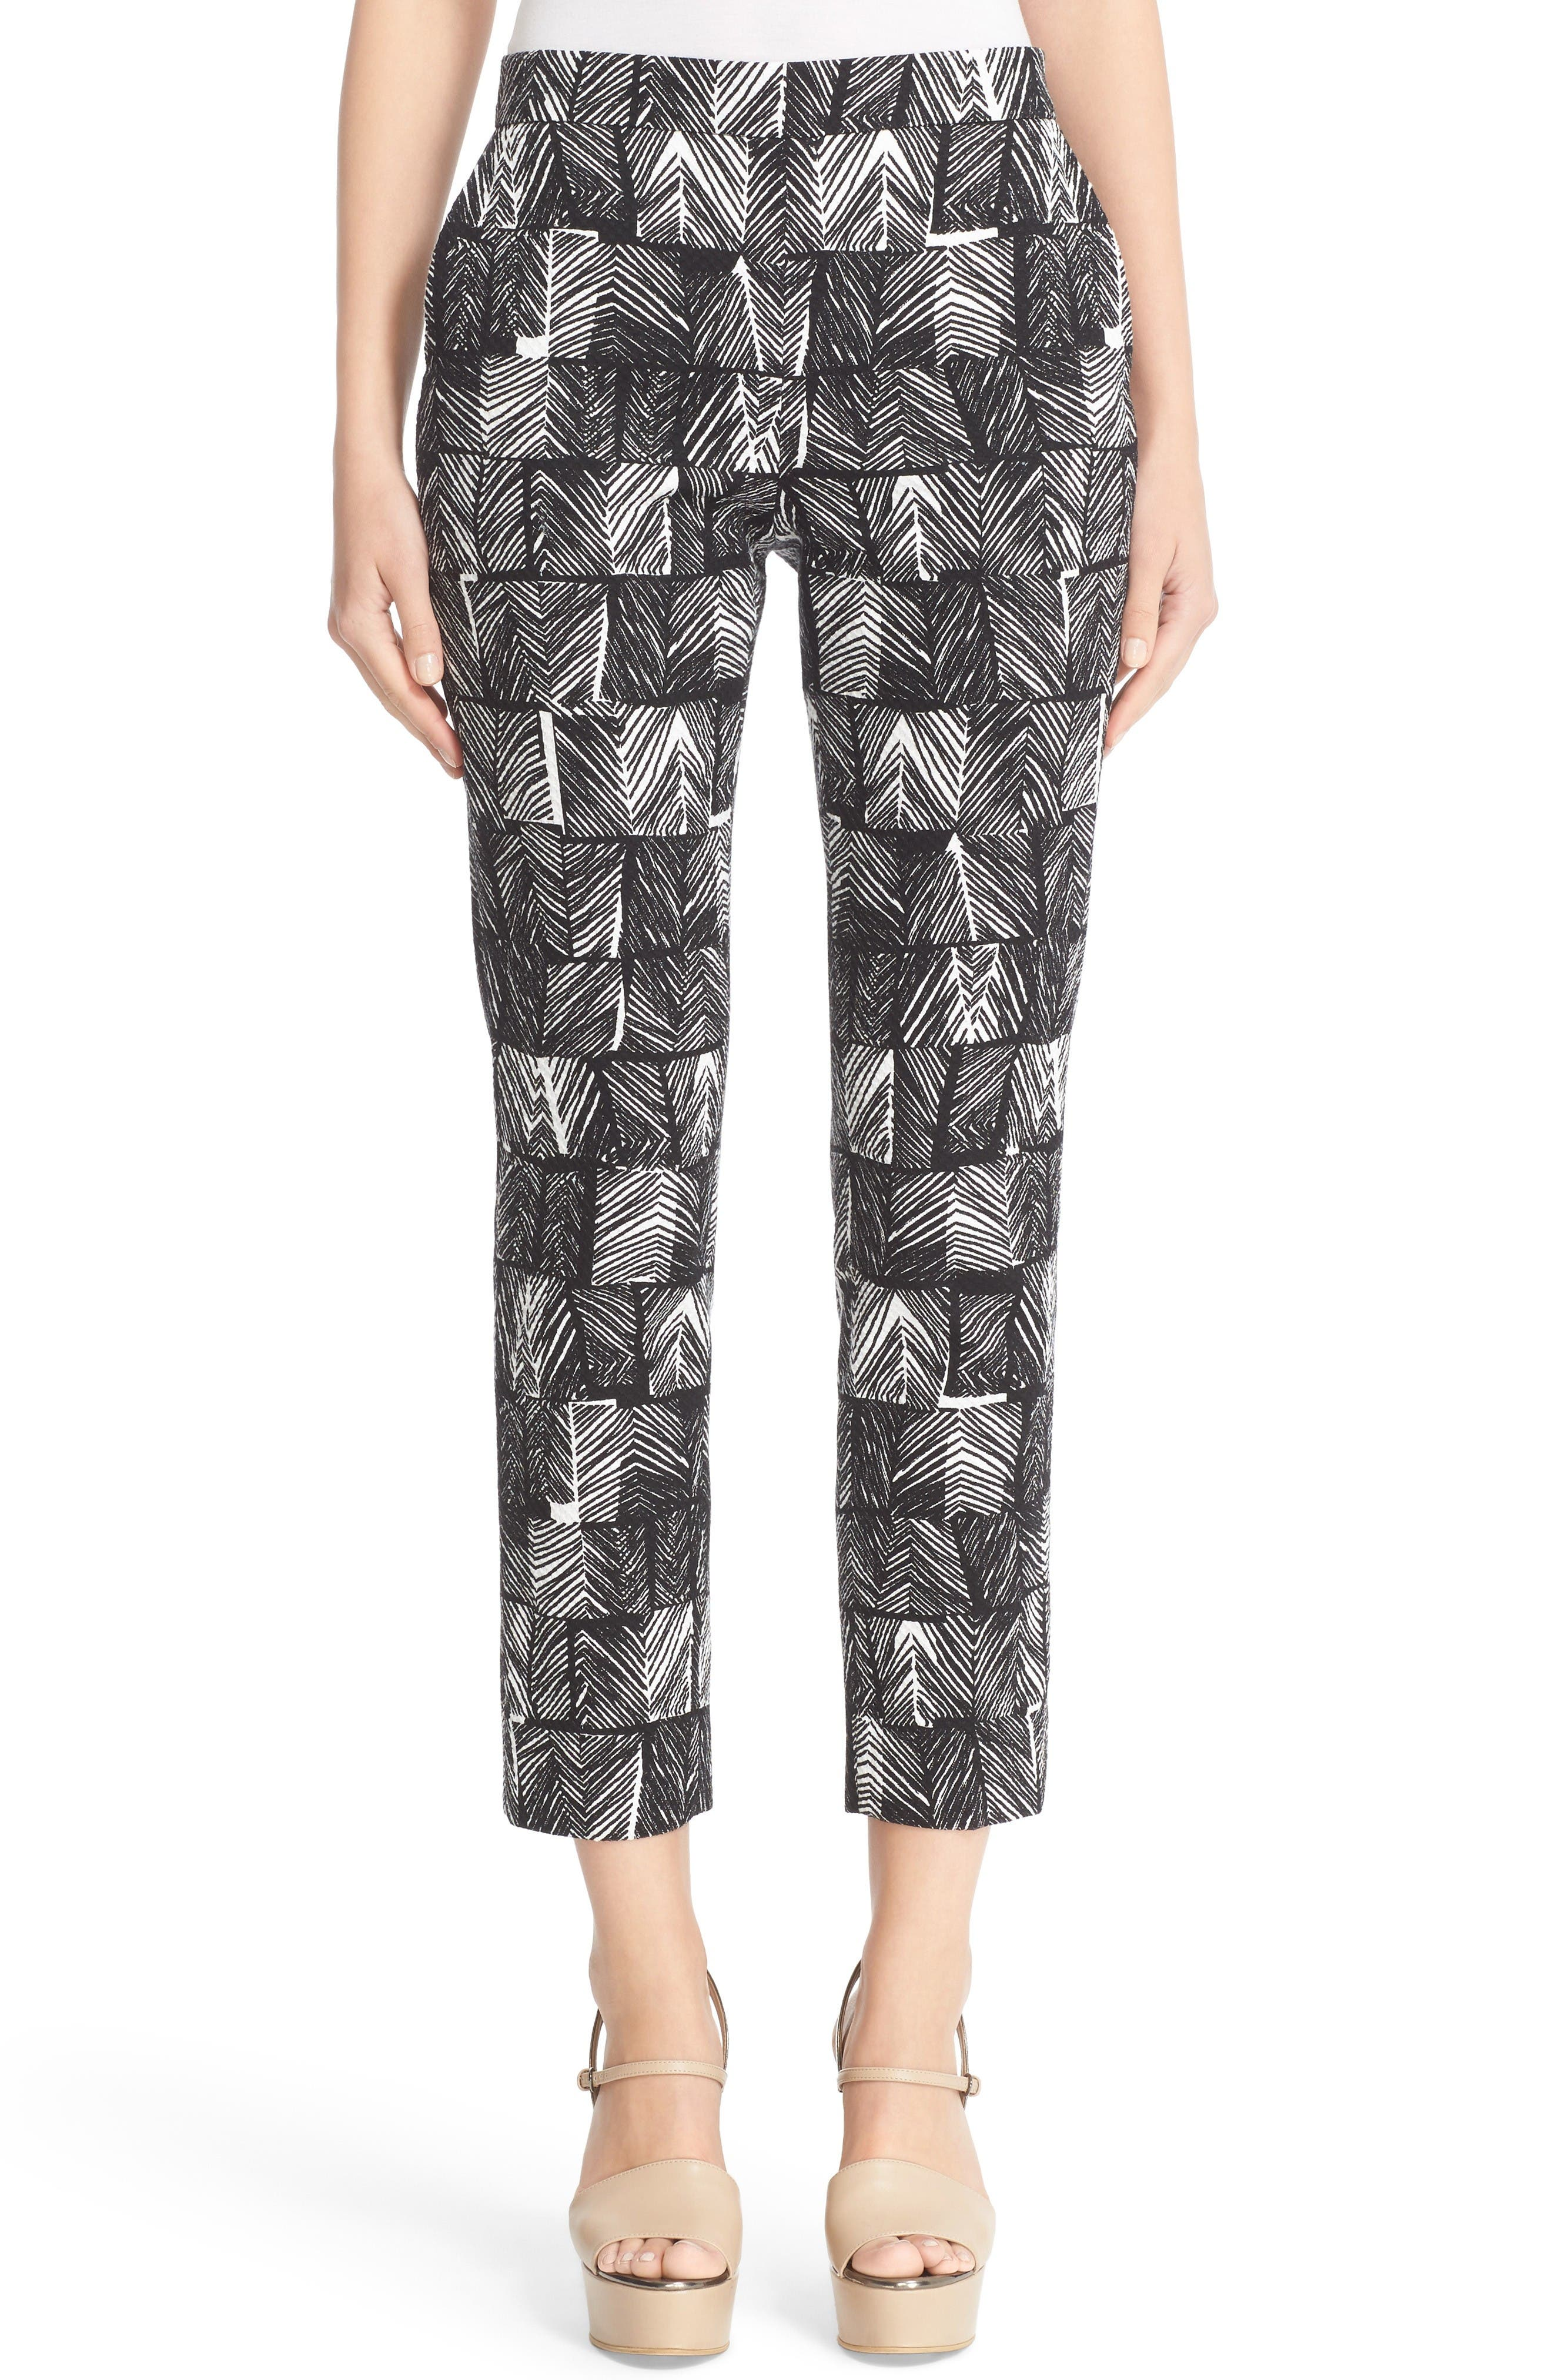 Alternate Image 1 Selected - Max Mara Paggio Graphic Print Crop Pants